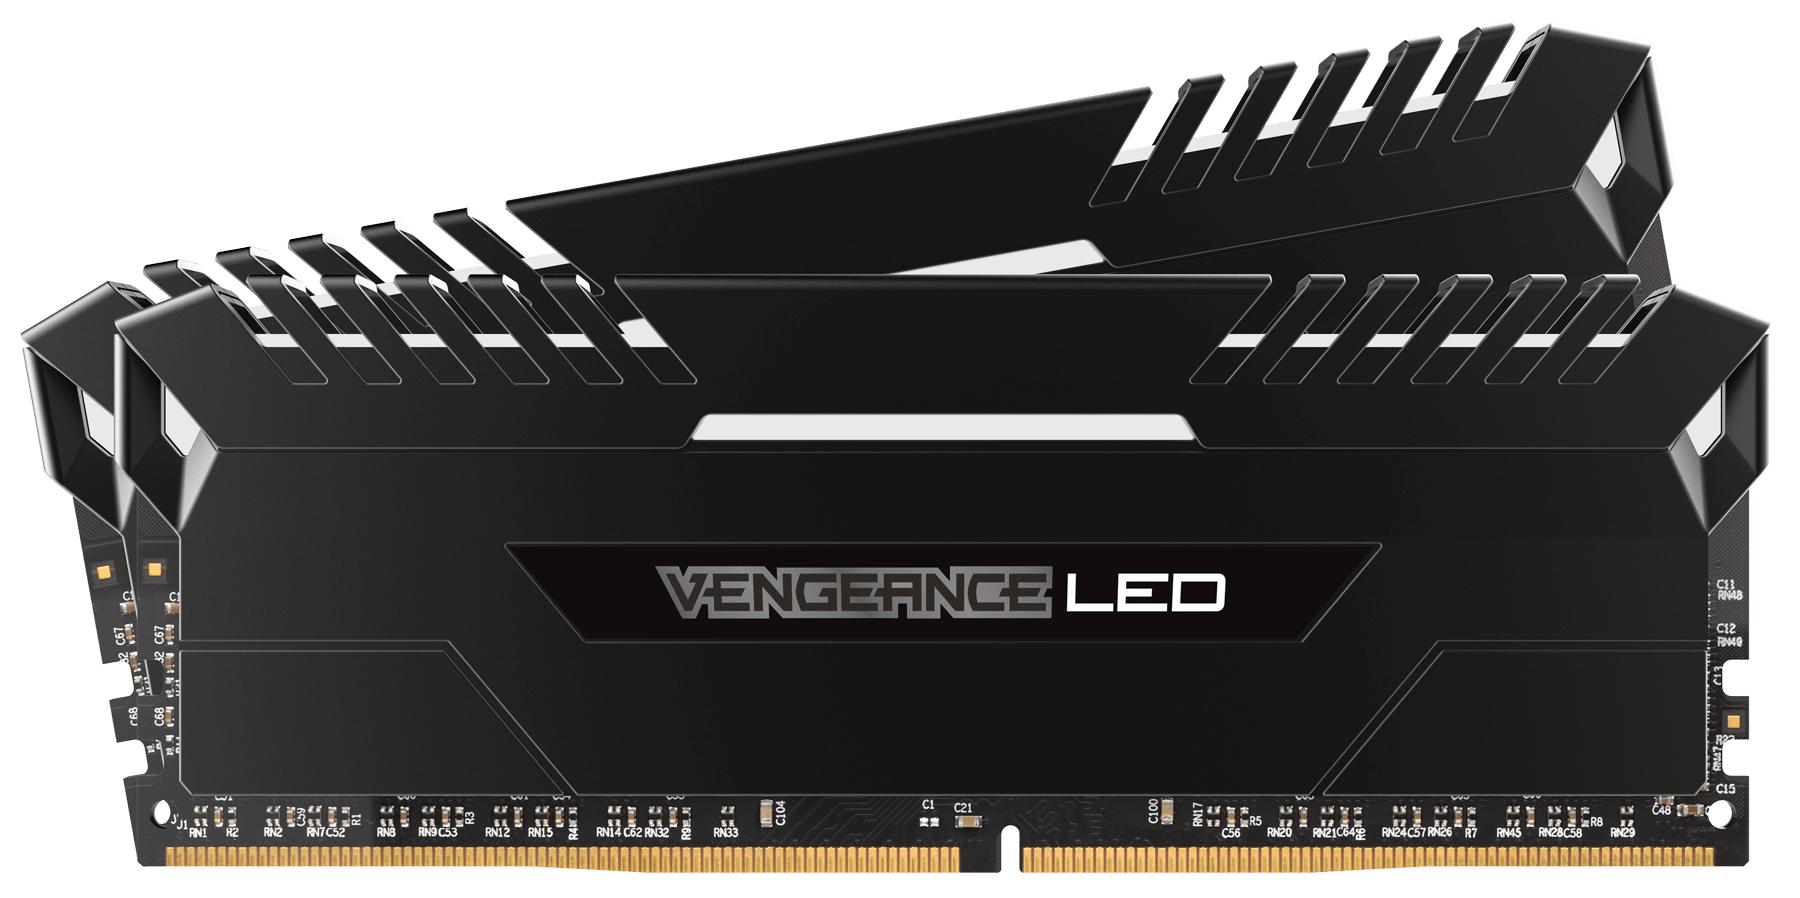 Corsair Vengeance LED 2x16GB DDR4-2666 32GB DDR4 2666MHz memory module